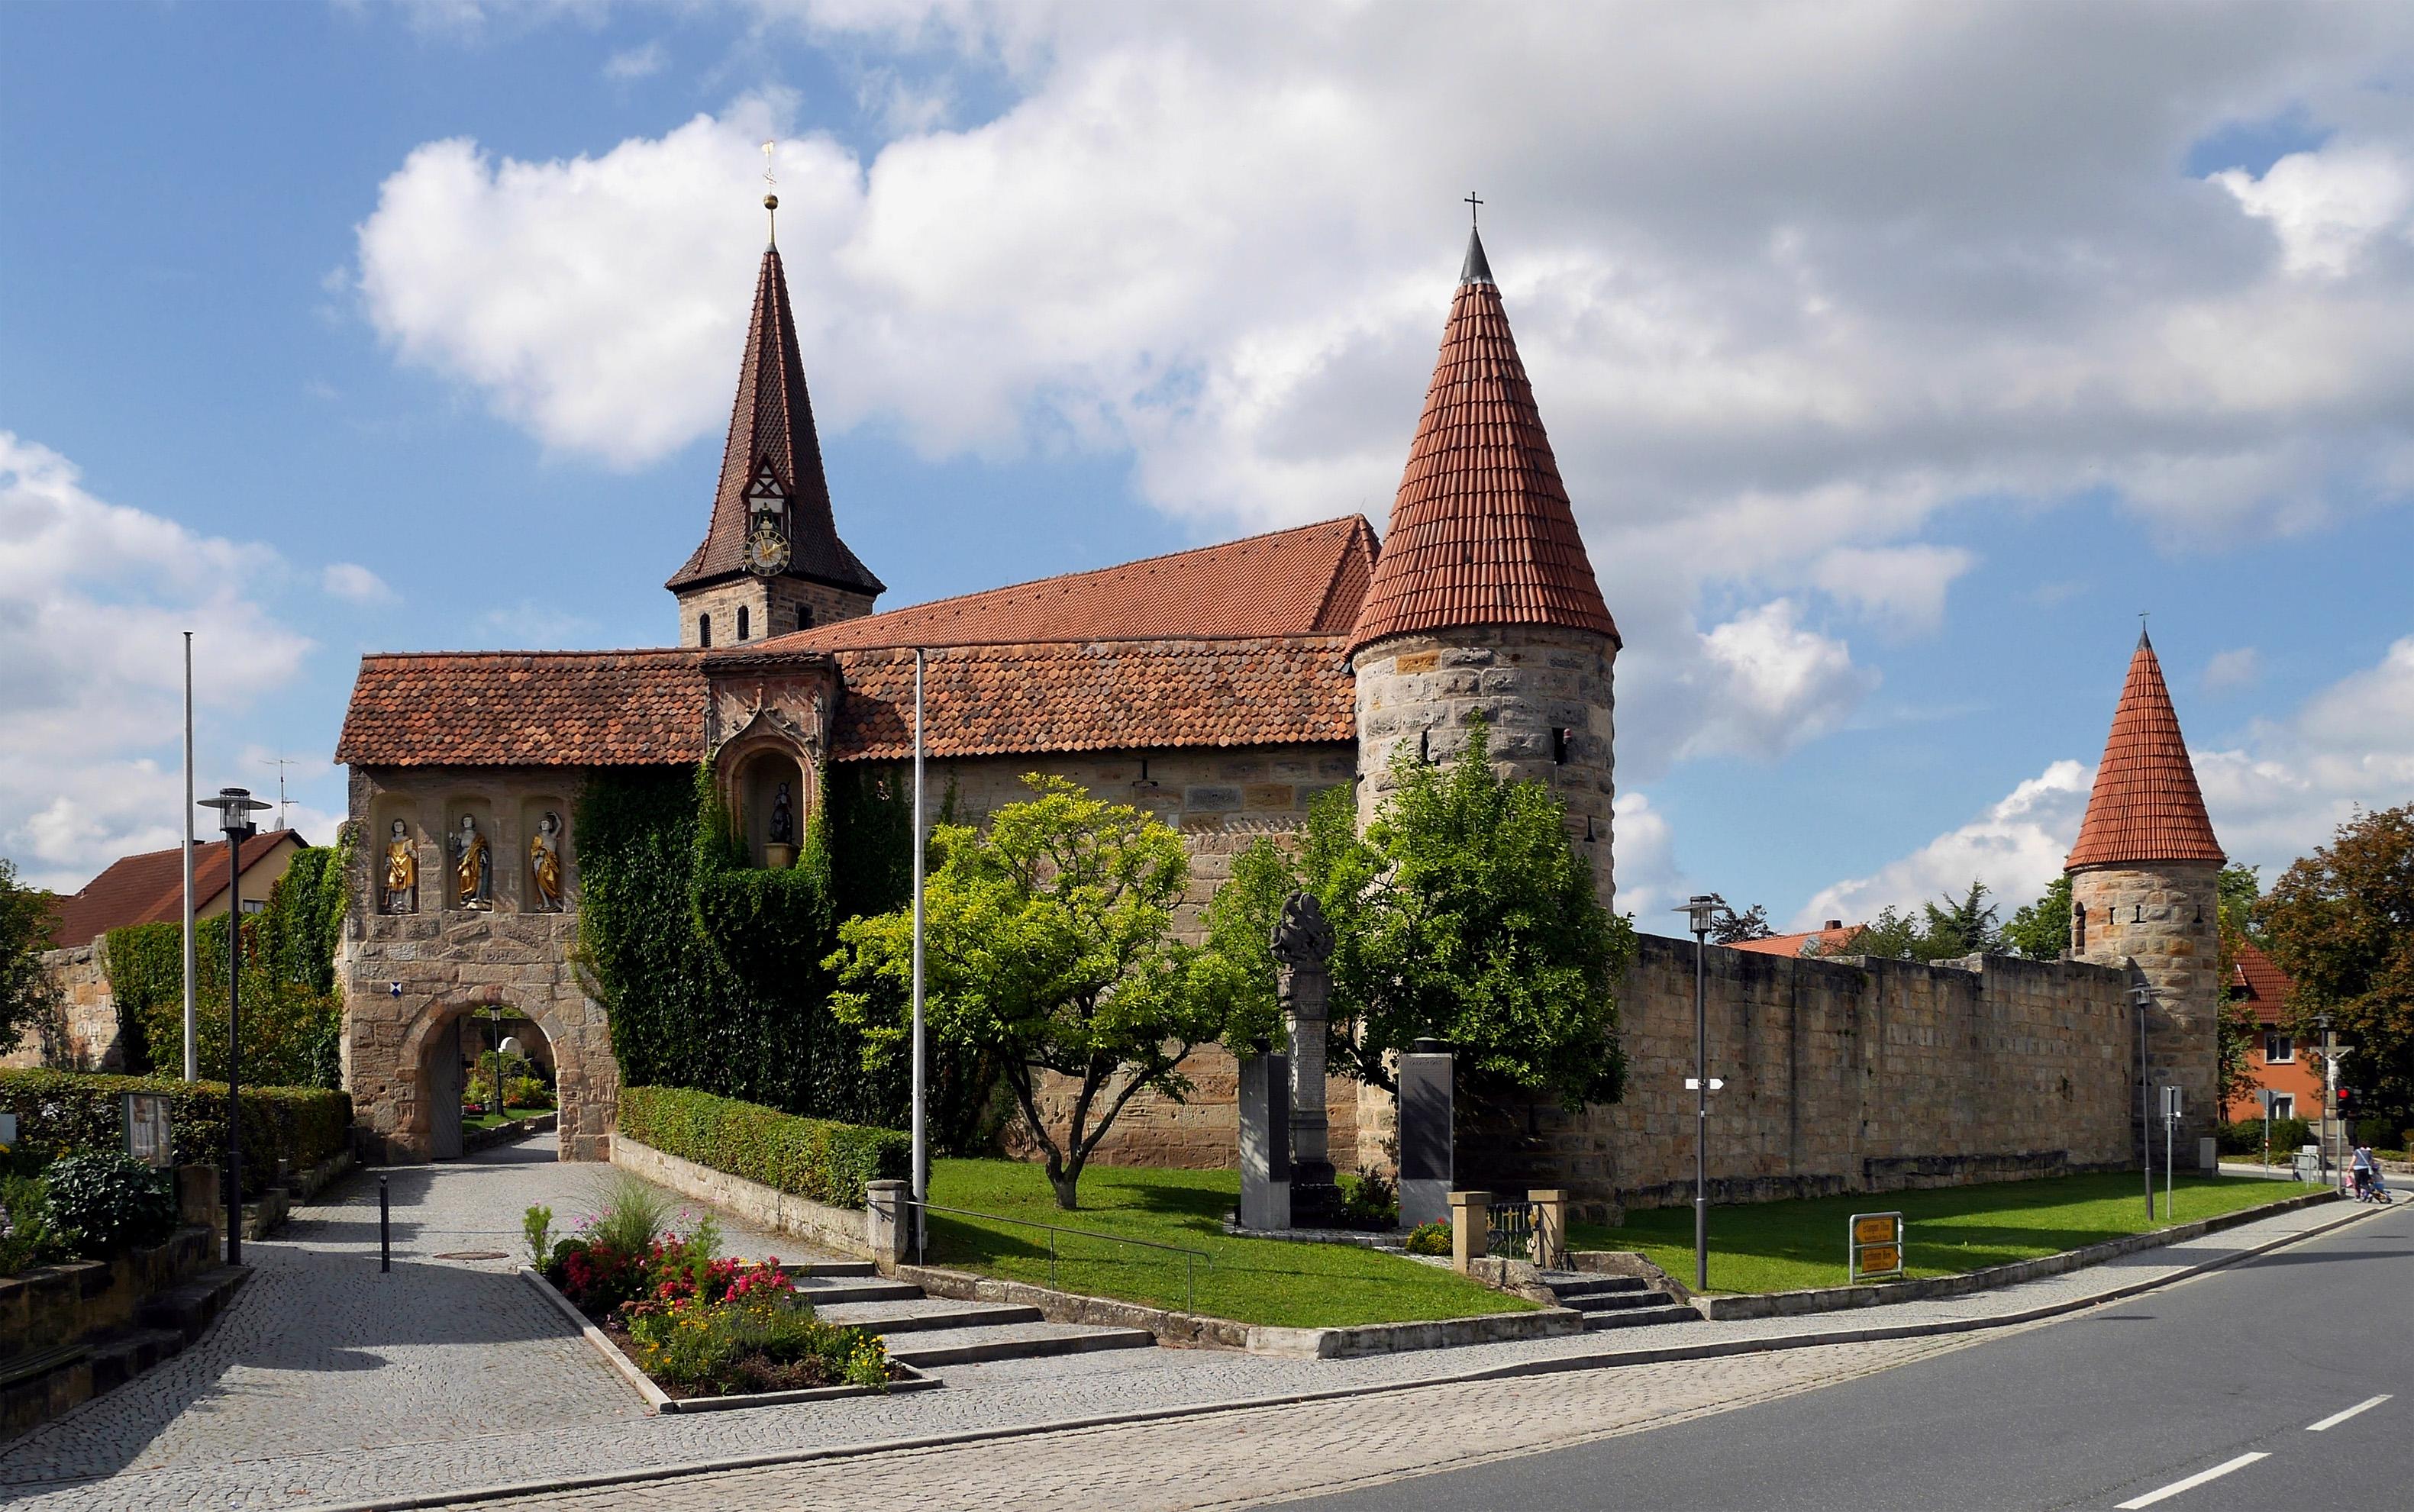 https://upload.wikimedia.org/wikipedia/commons/b/b2/Kirchenburg_in_Effeltrich.jpg